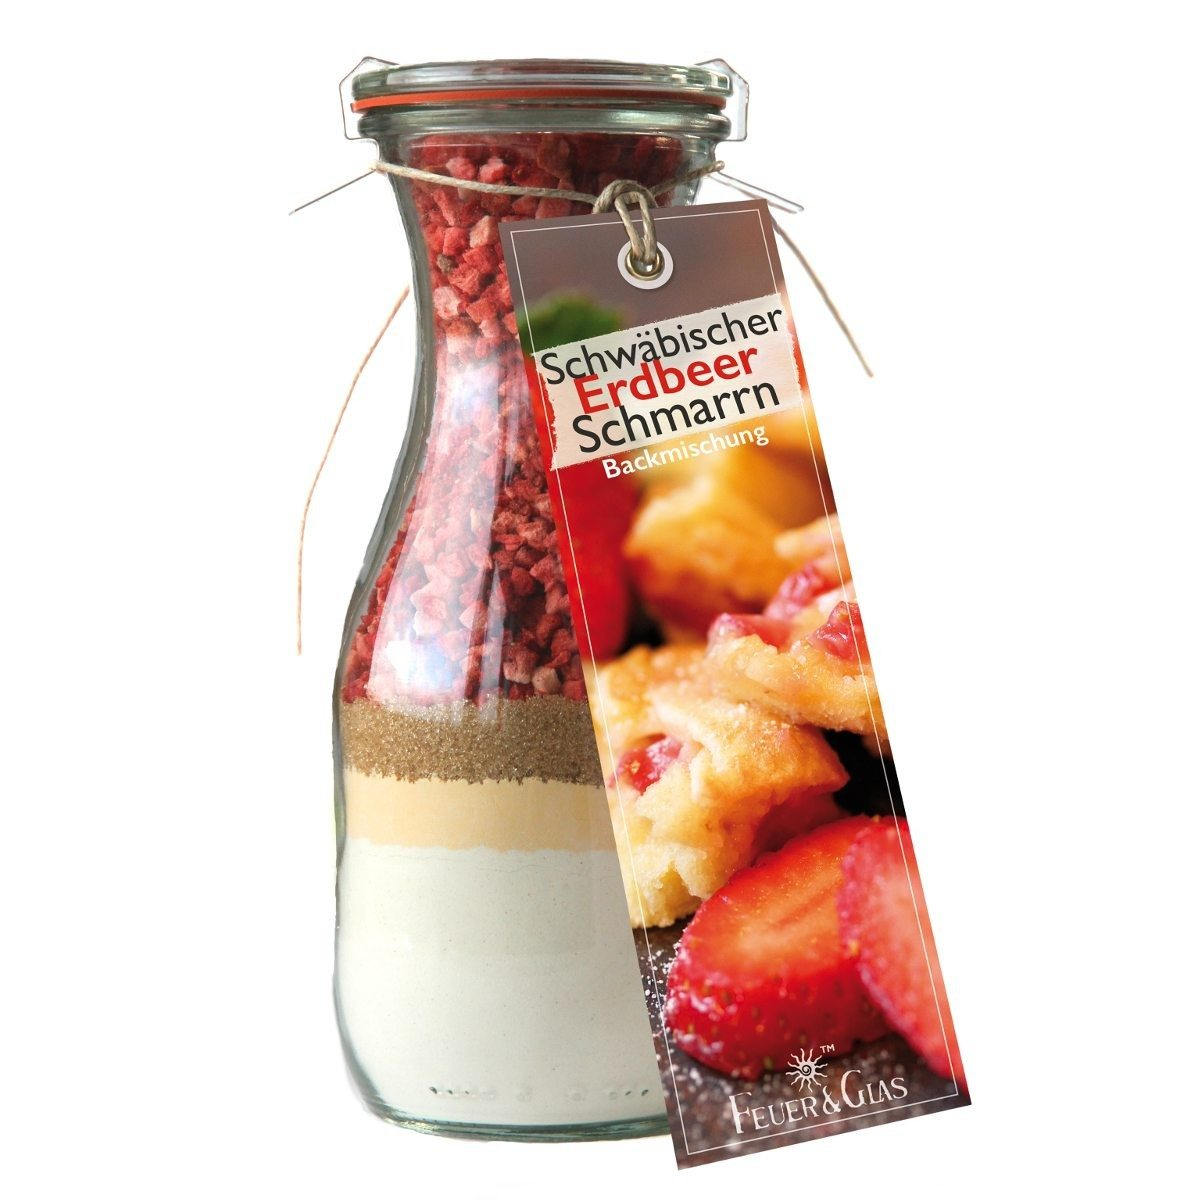 Schwäbischer Erdbeerschmarrn - Backmischung im Glas